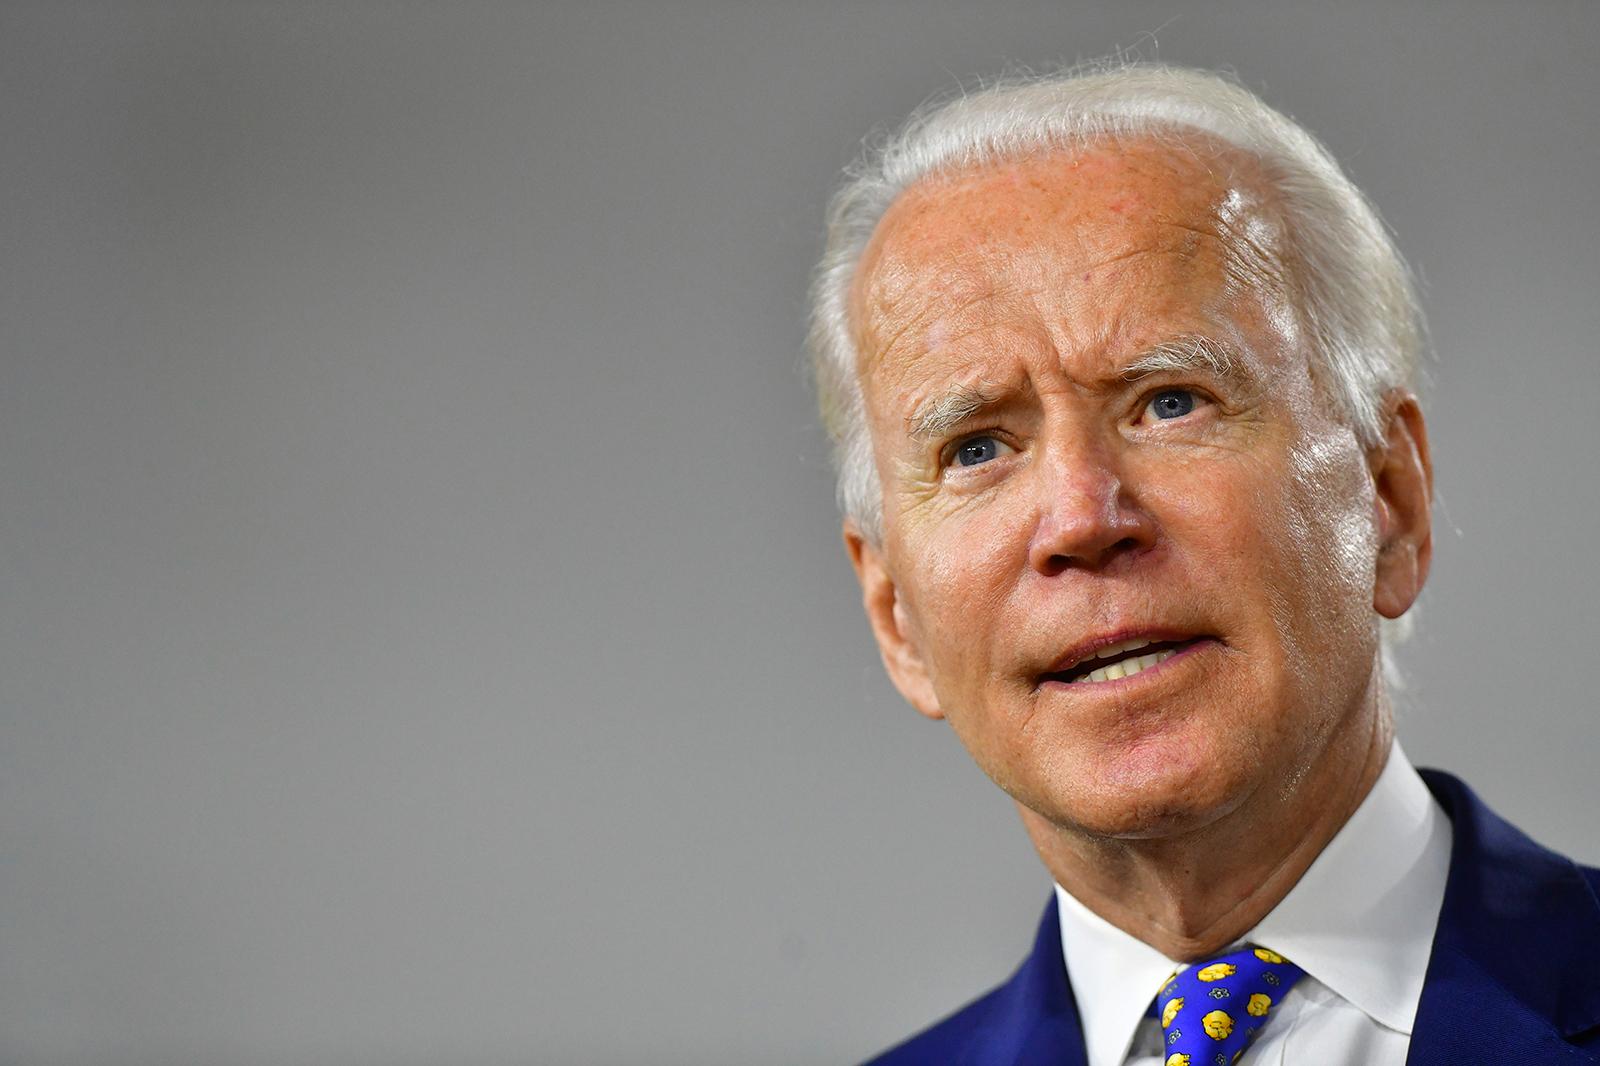 Presumptive Democratic presidential nominee former Vice President Joe Biden delivers a speech at the William Hicks Anderson Community Center, on July 28, in Wilmington, Delaware.